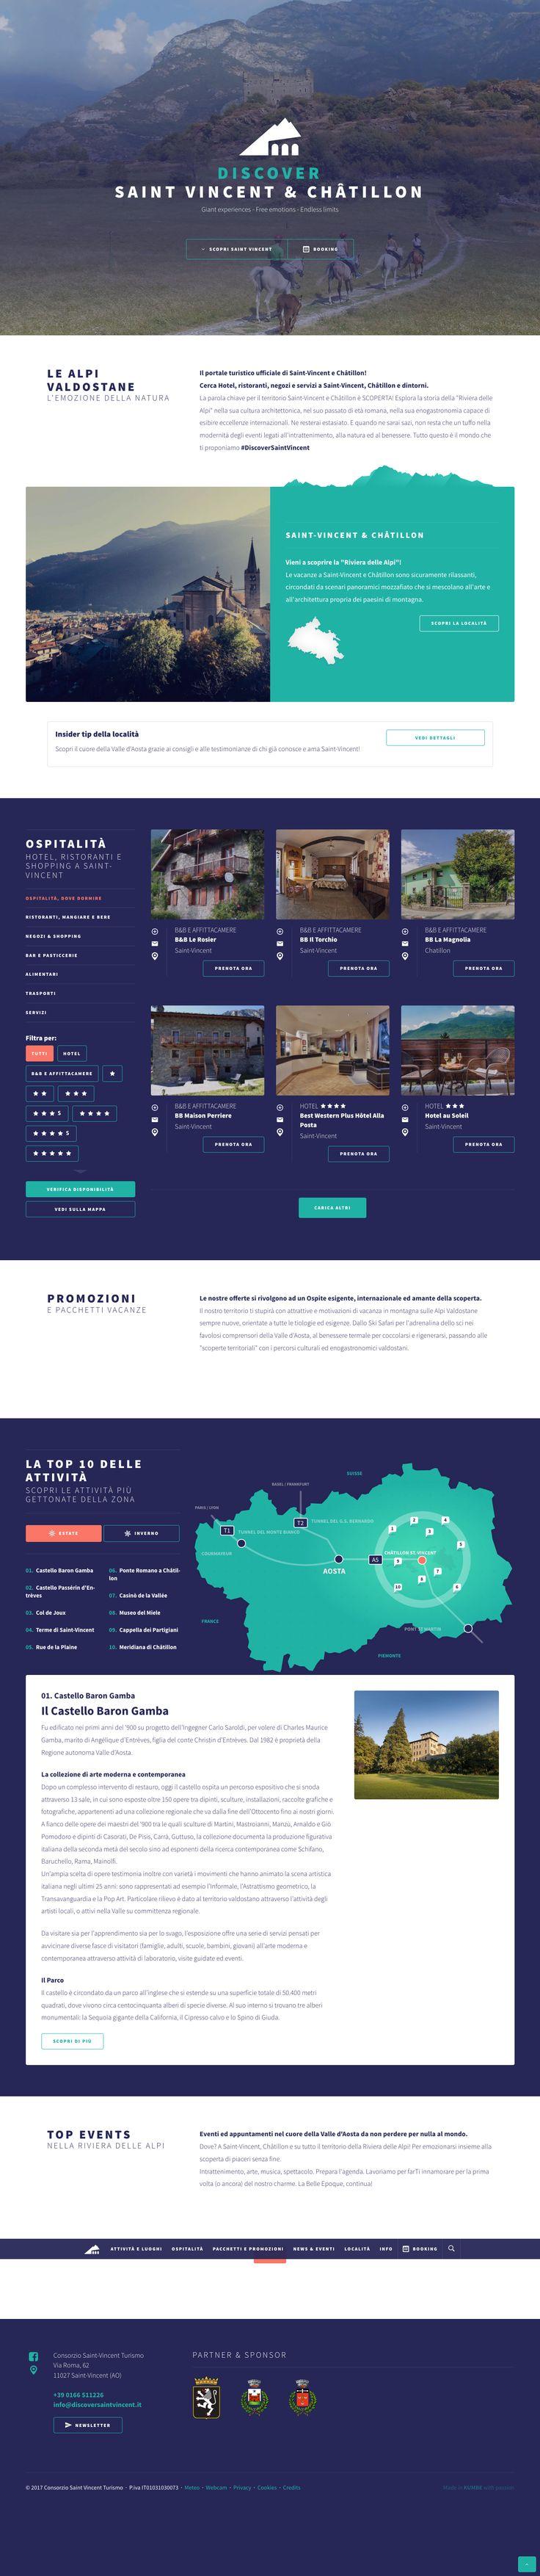 #discoversaintvincent www.discoversaintvincent.it #kumbe #portfolio #webdesign #website #responsivedesign #tourism #discover #mountain #experiences #giantexperiences #freeemotions #endlesslimits #emozione #natura #alpi #mountains #portaleturistico #hotel #ristoranti #negozi #servizi #rivieradellealpi #relax #skisafari #ski #trekking #saintvincent #châtillon #valledaosta #alpivaldostane #italia